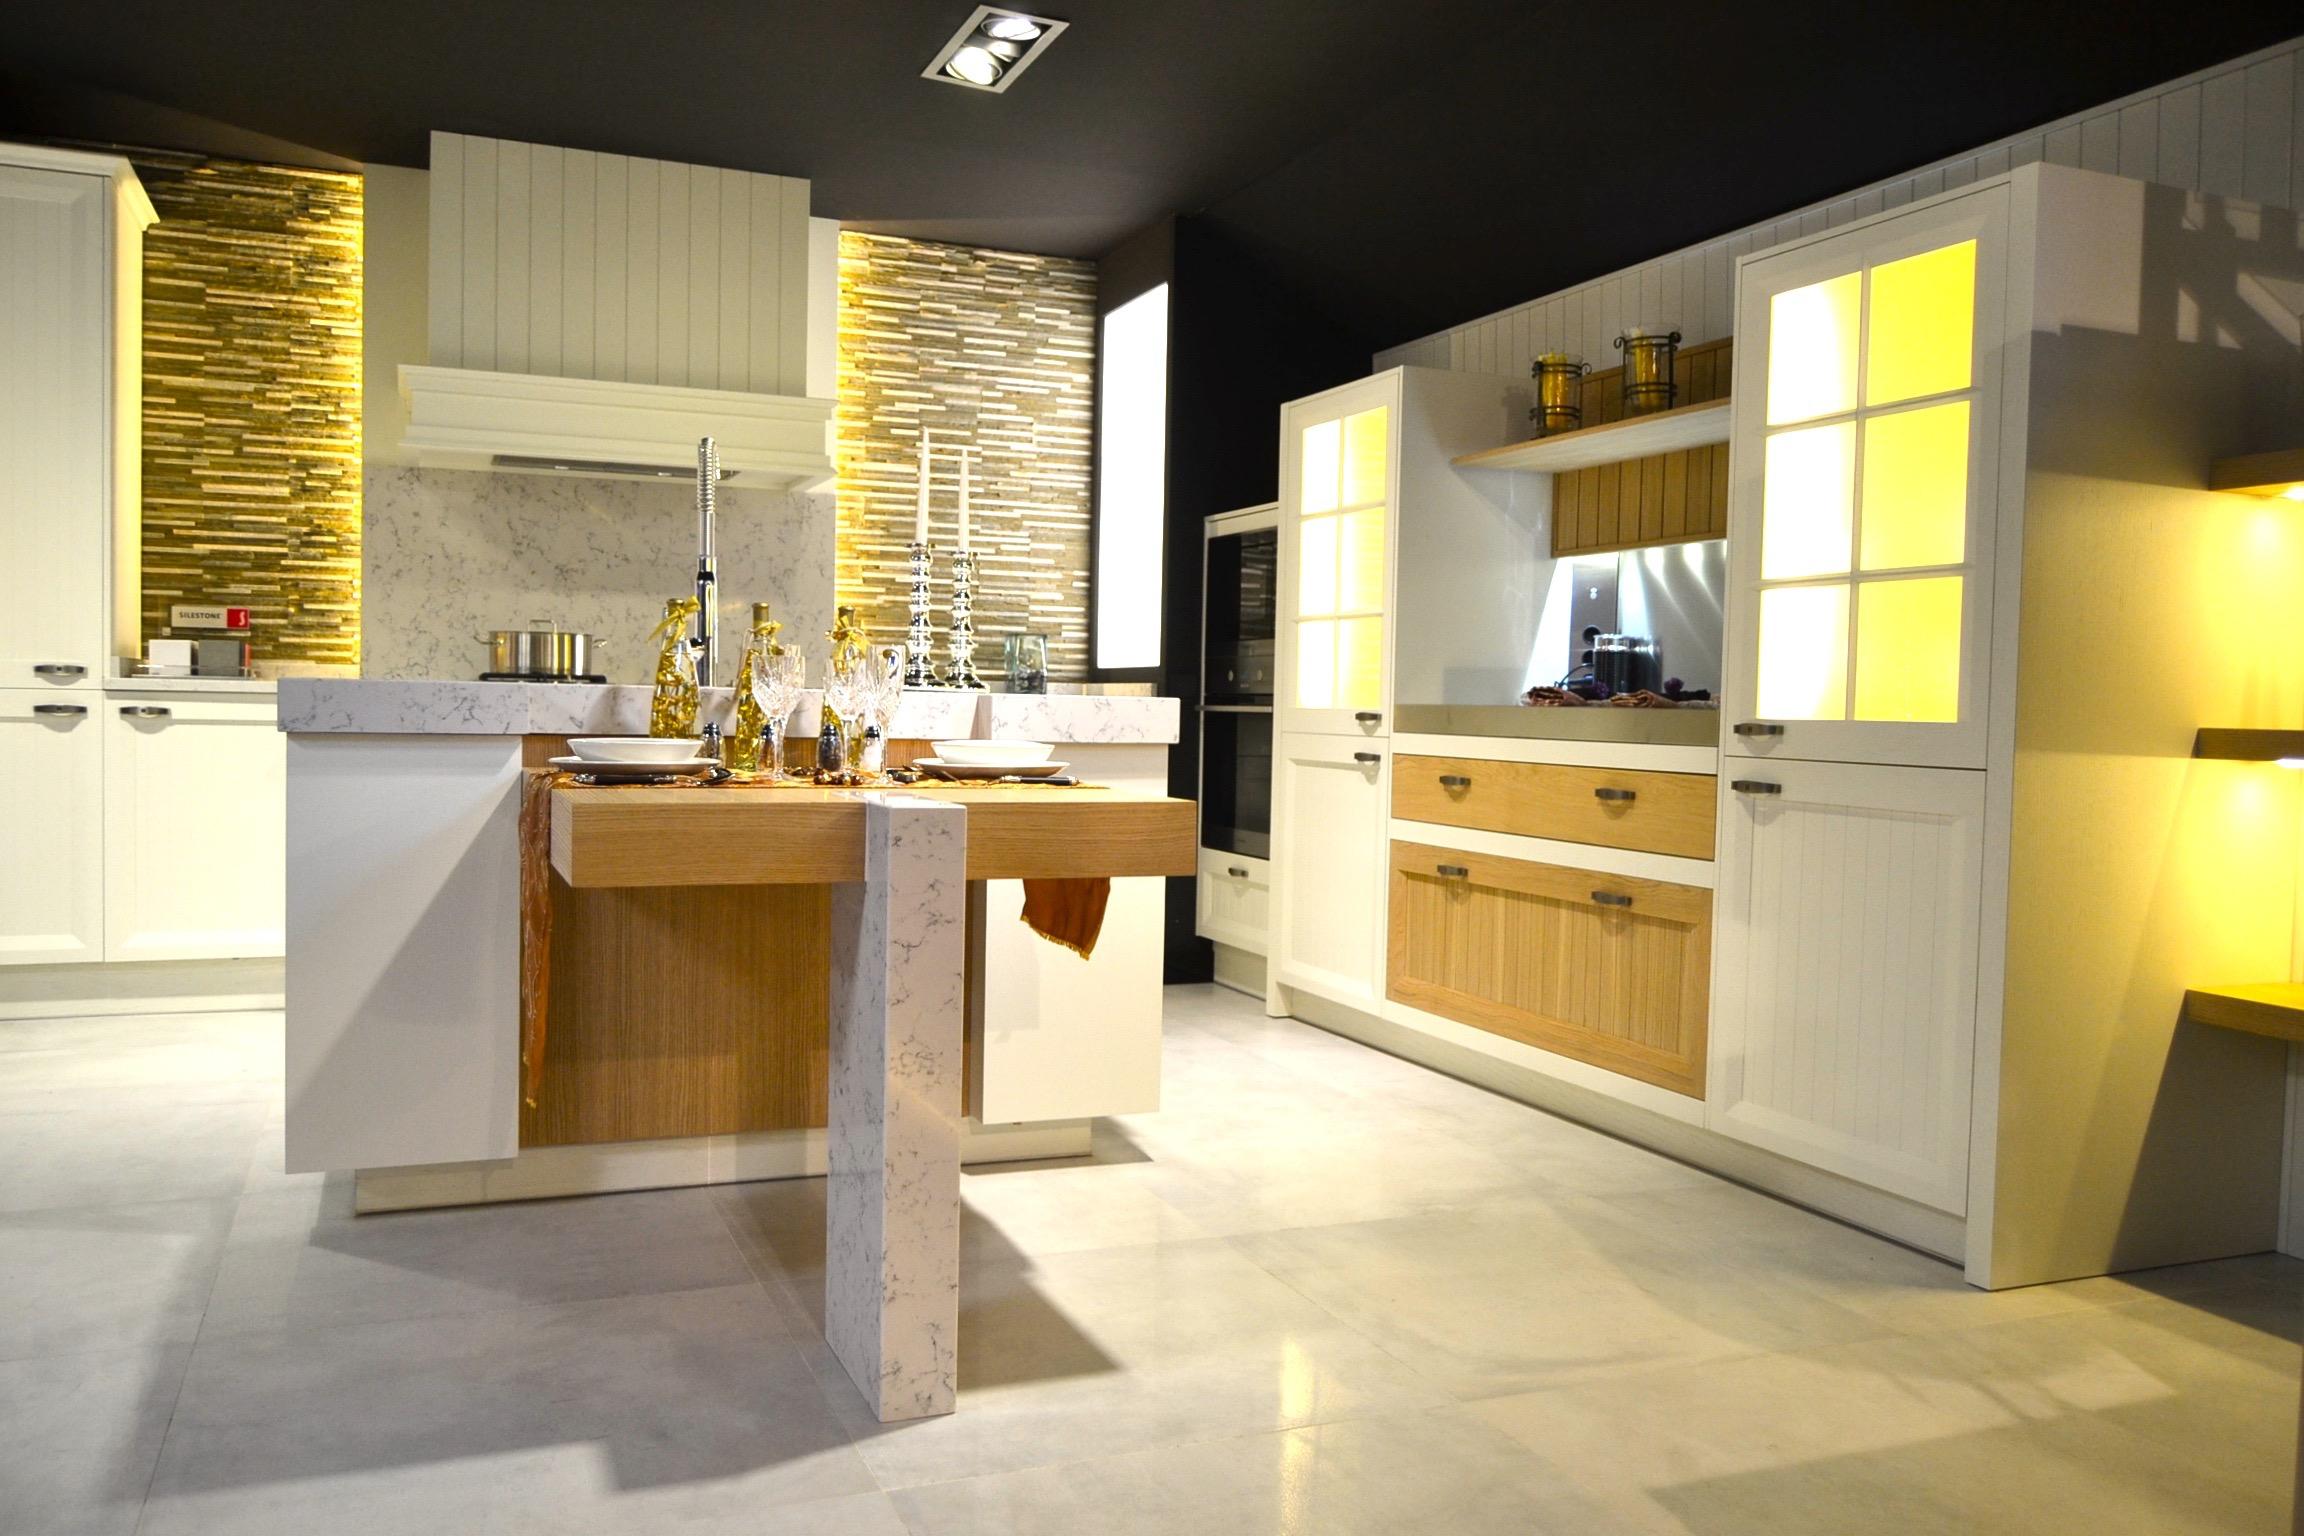 Madera Estilo Moderno Cocinas J A Martin # Muebles Muy Baratos